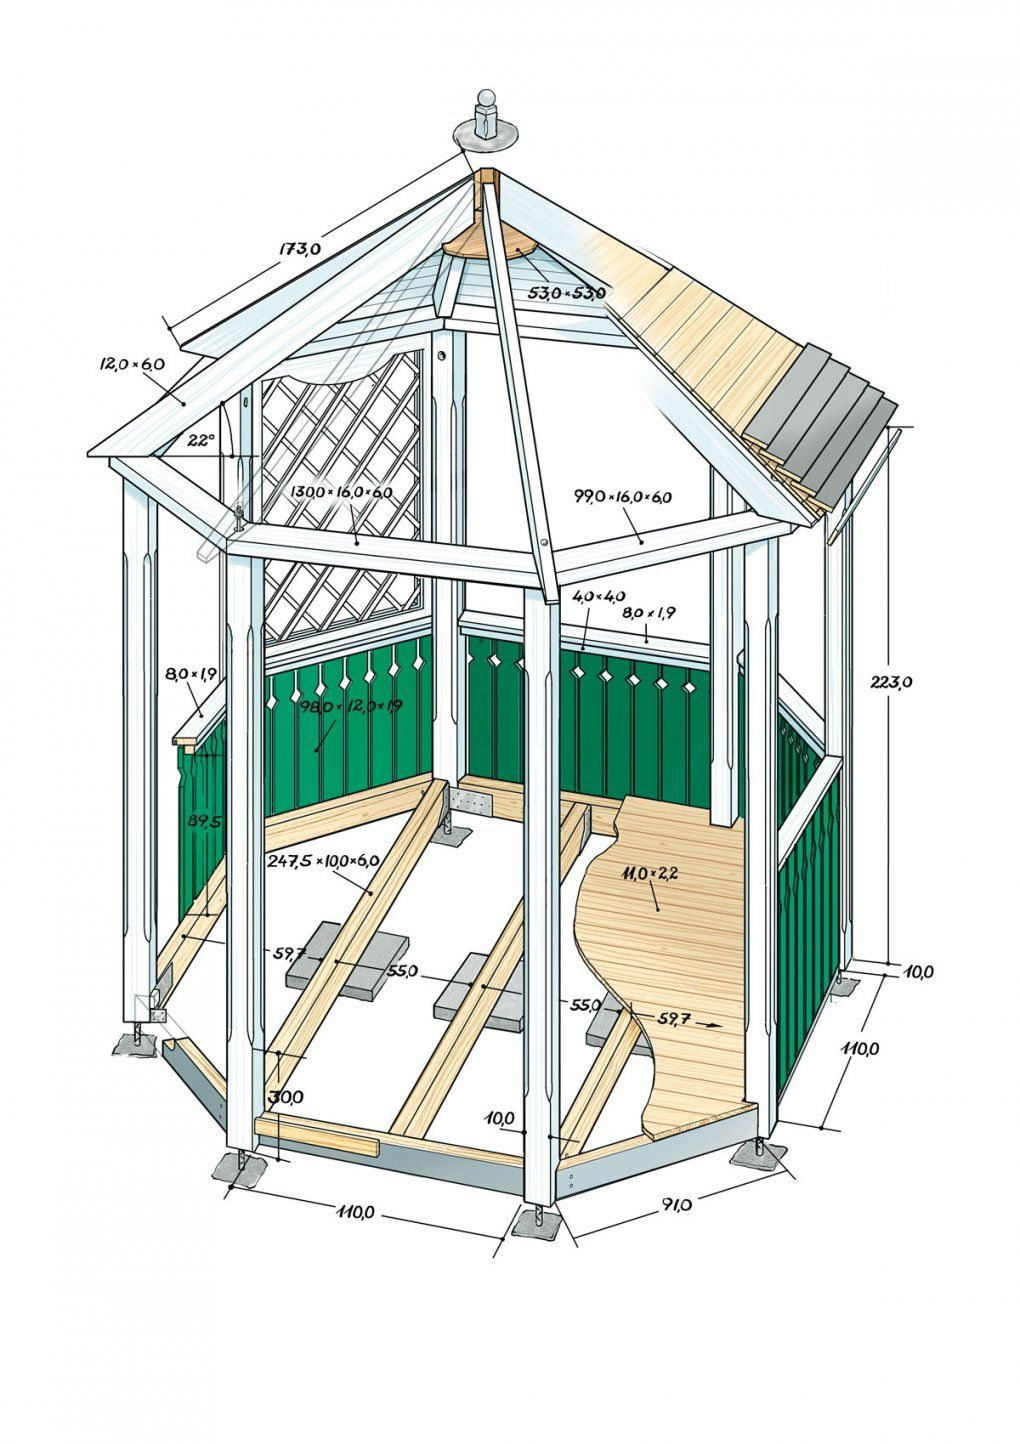 Pavillon Selber Bauen Anleitung von Gartenpavillon Selber Bauen Anleitung Bild